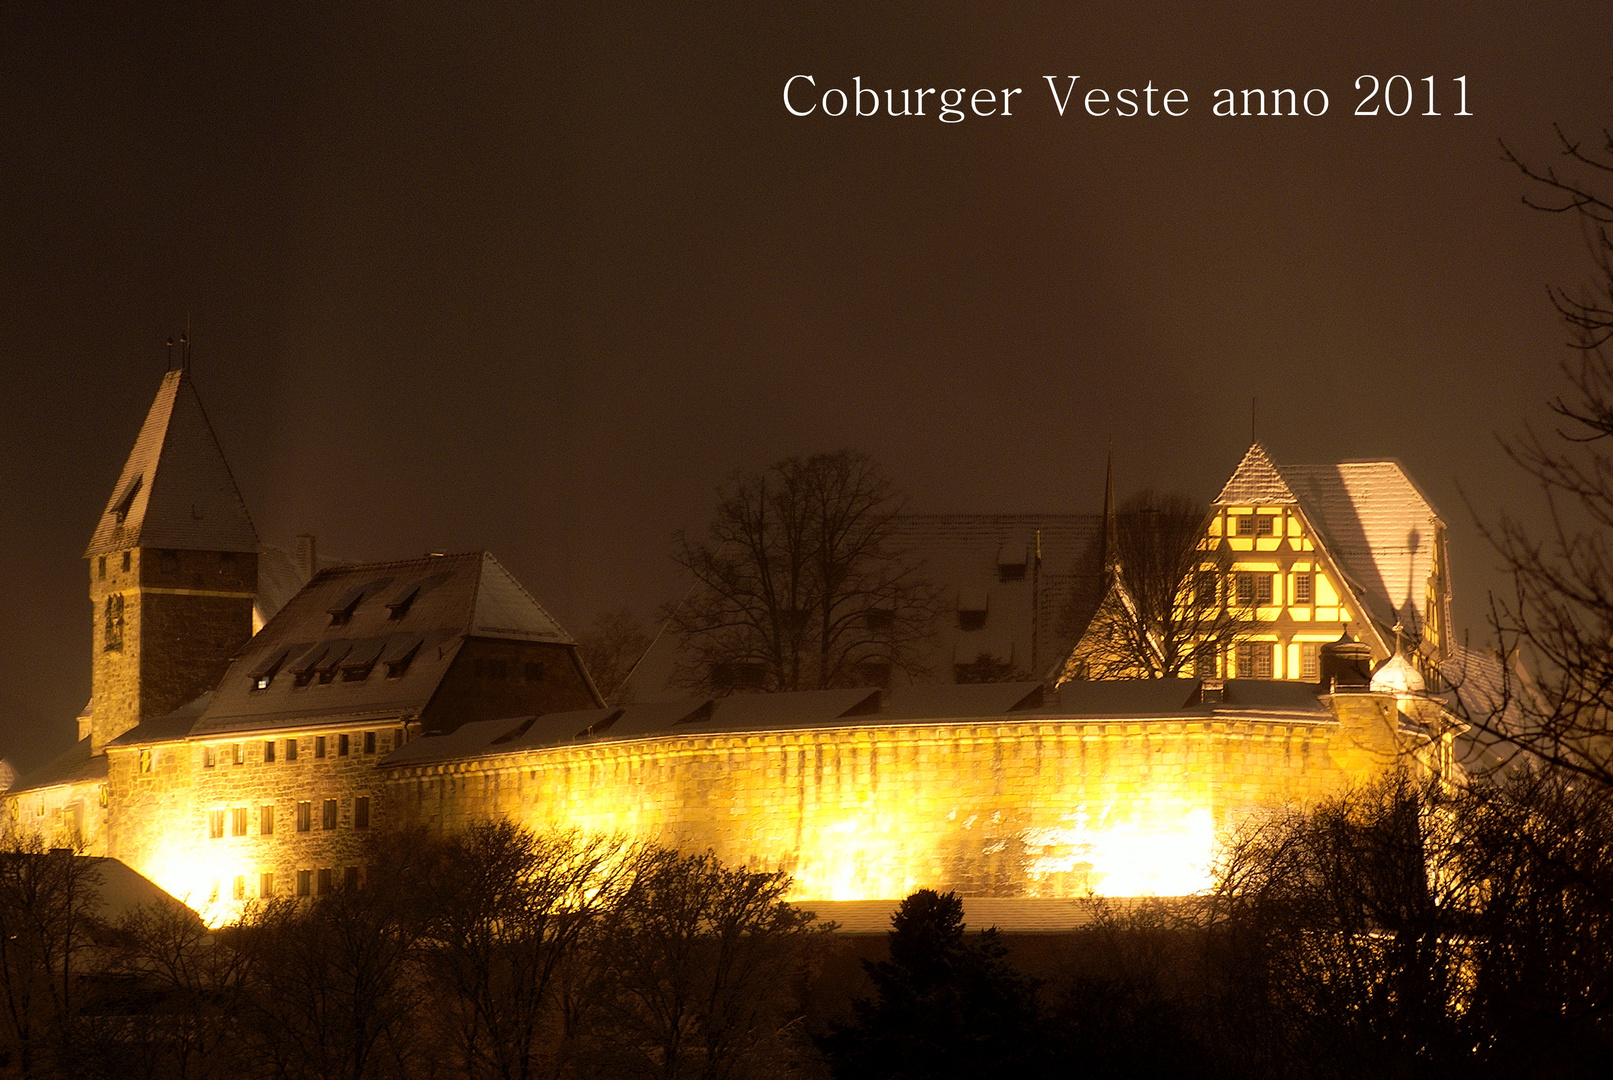 Coburger Veste